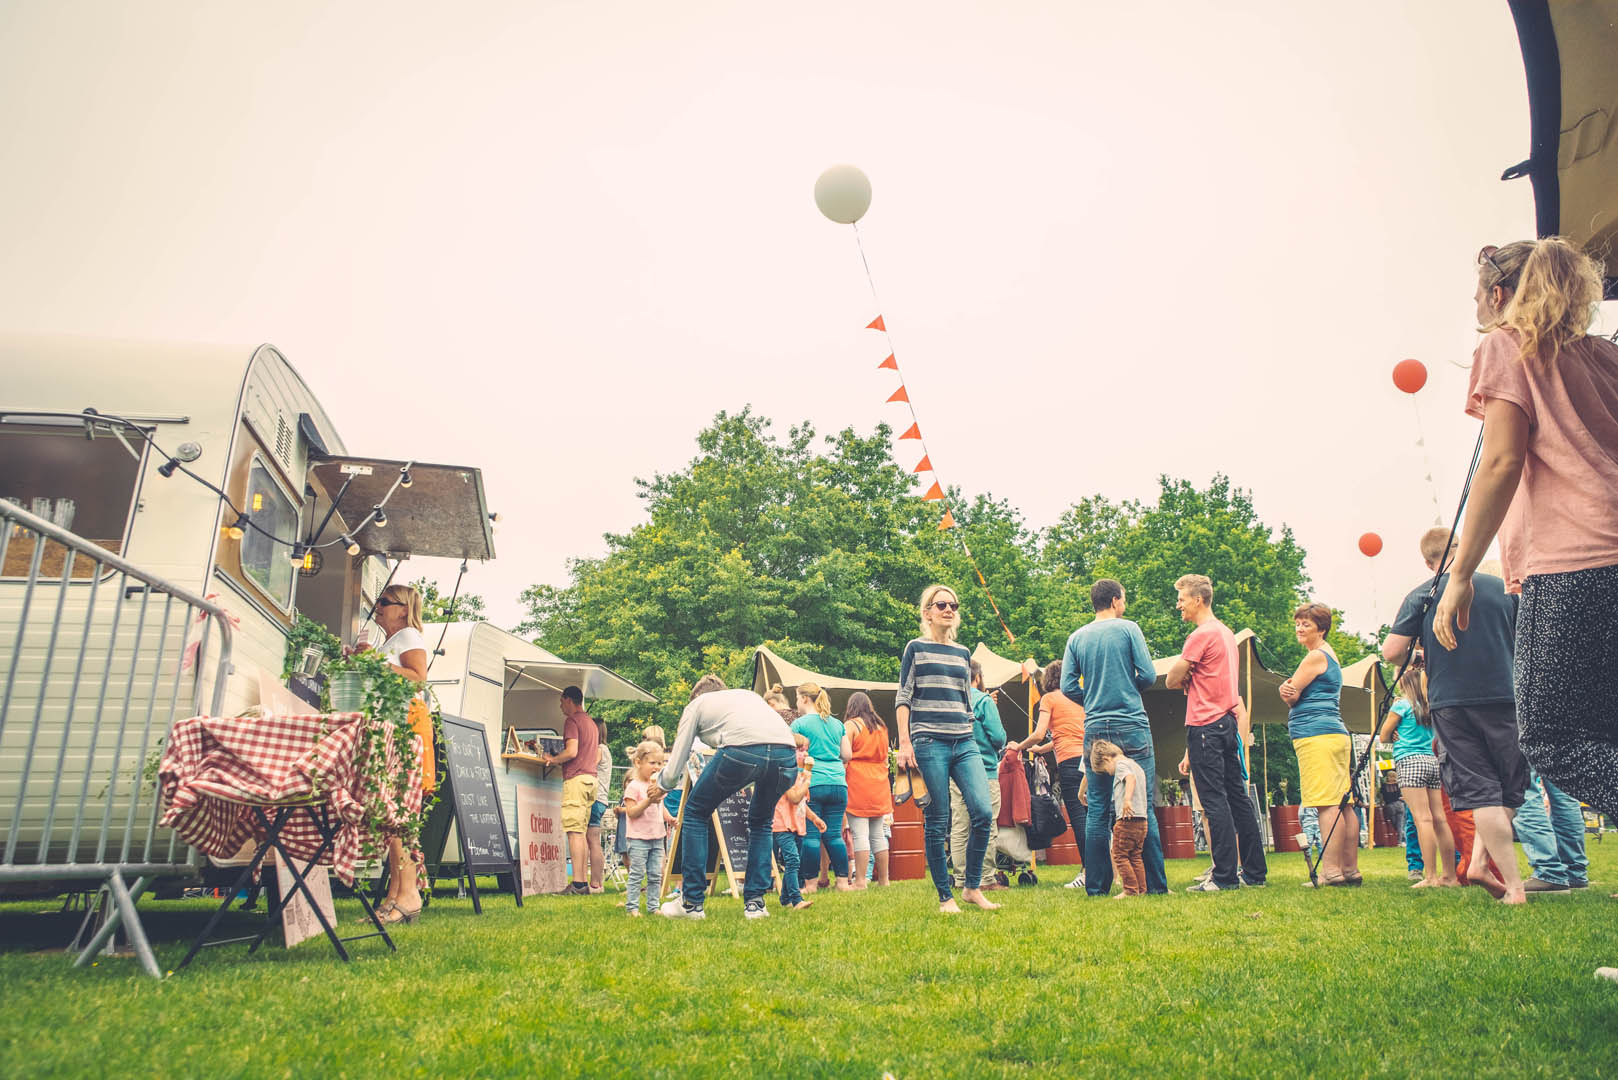 Stad Gent Picknick Event Groep